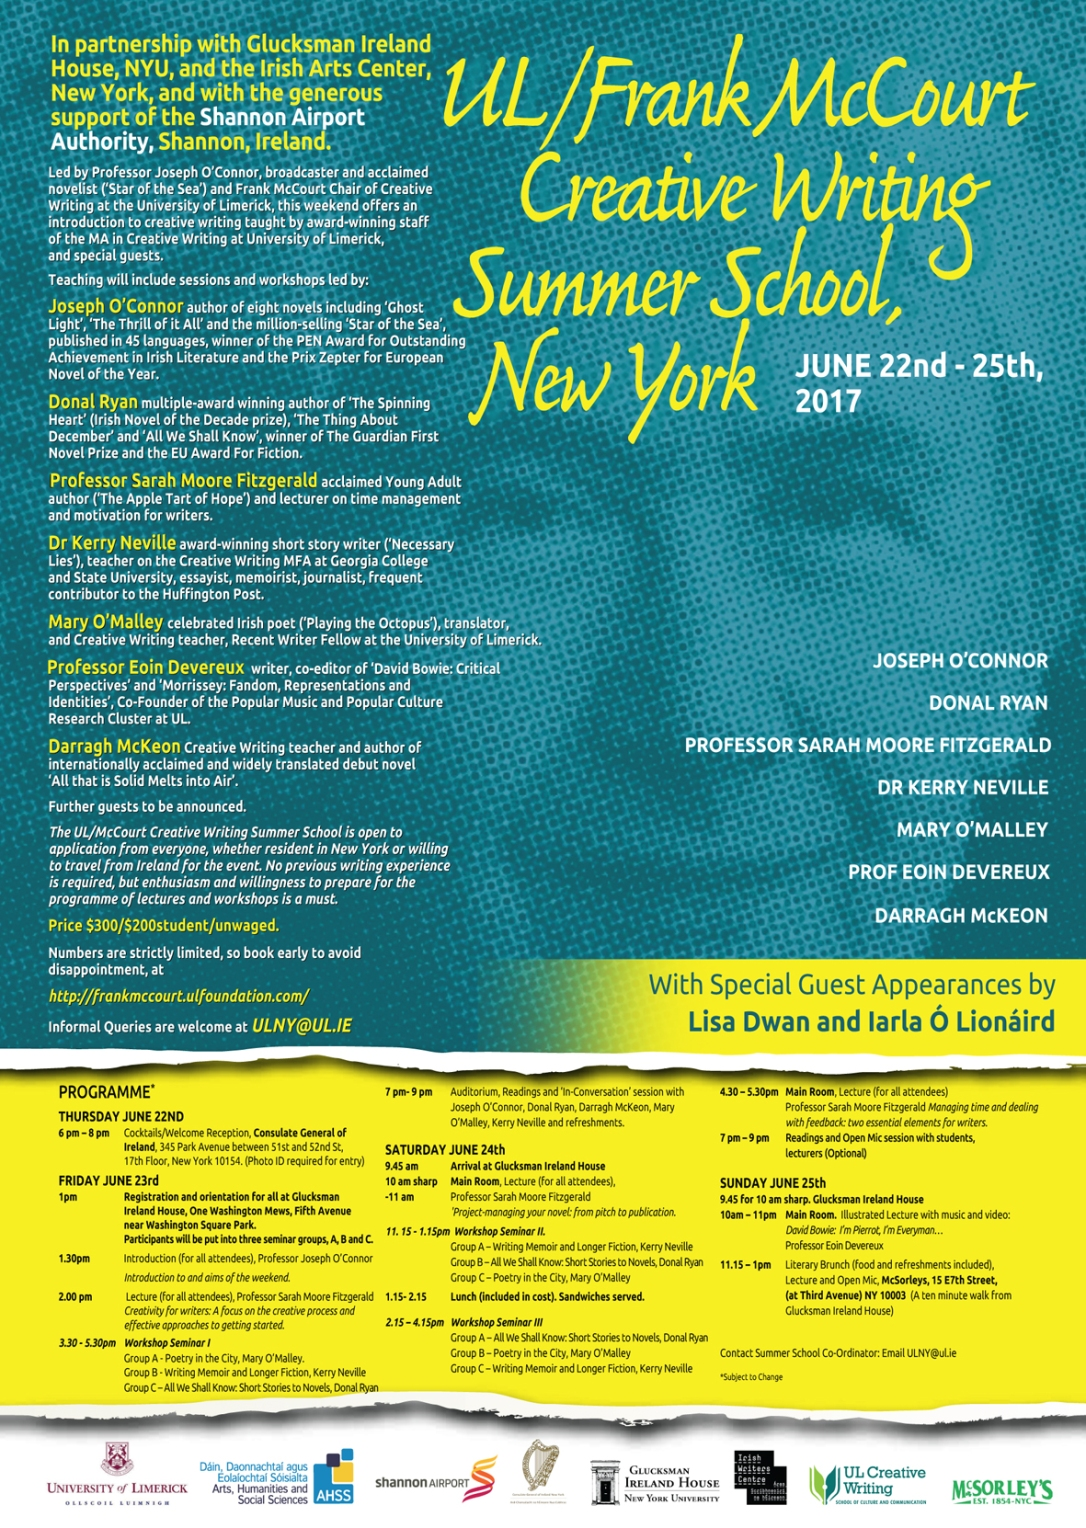 Frank McCourt poster A3 PRINT APRIL 26 PRINT HR